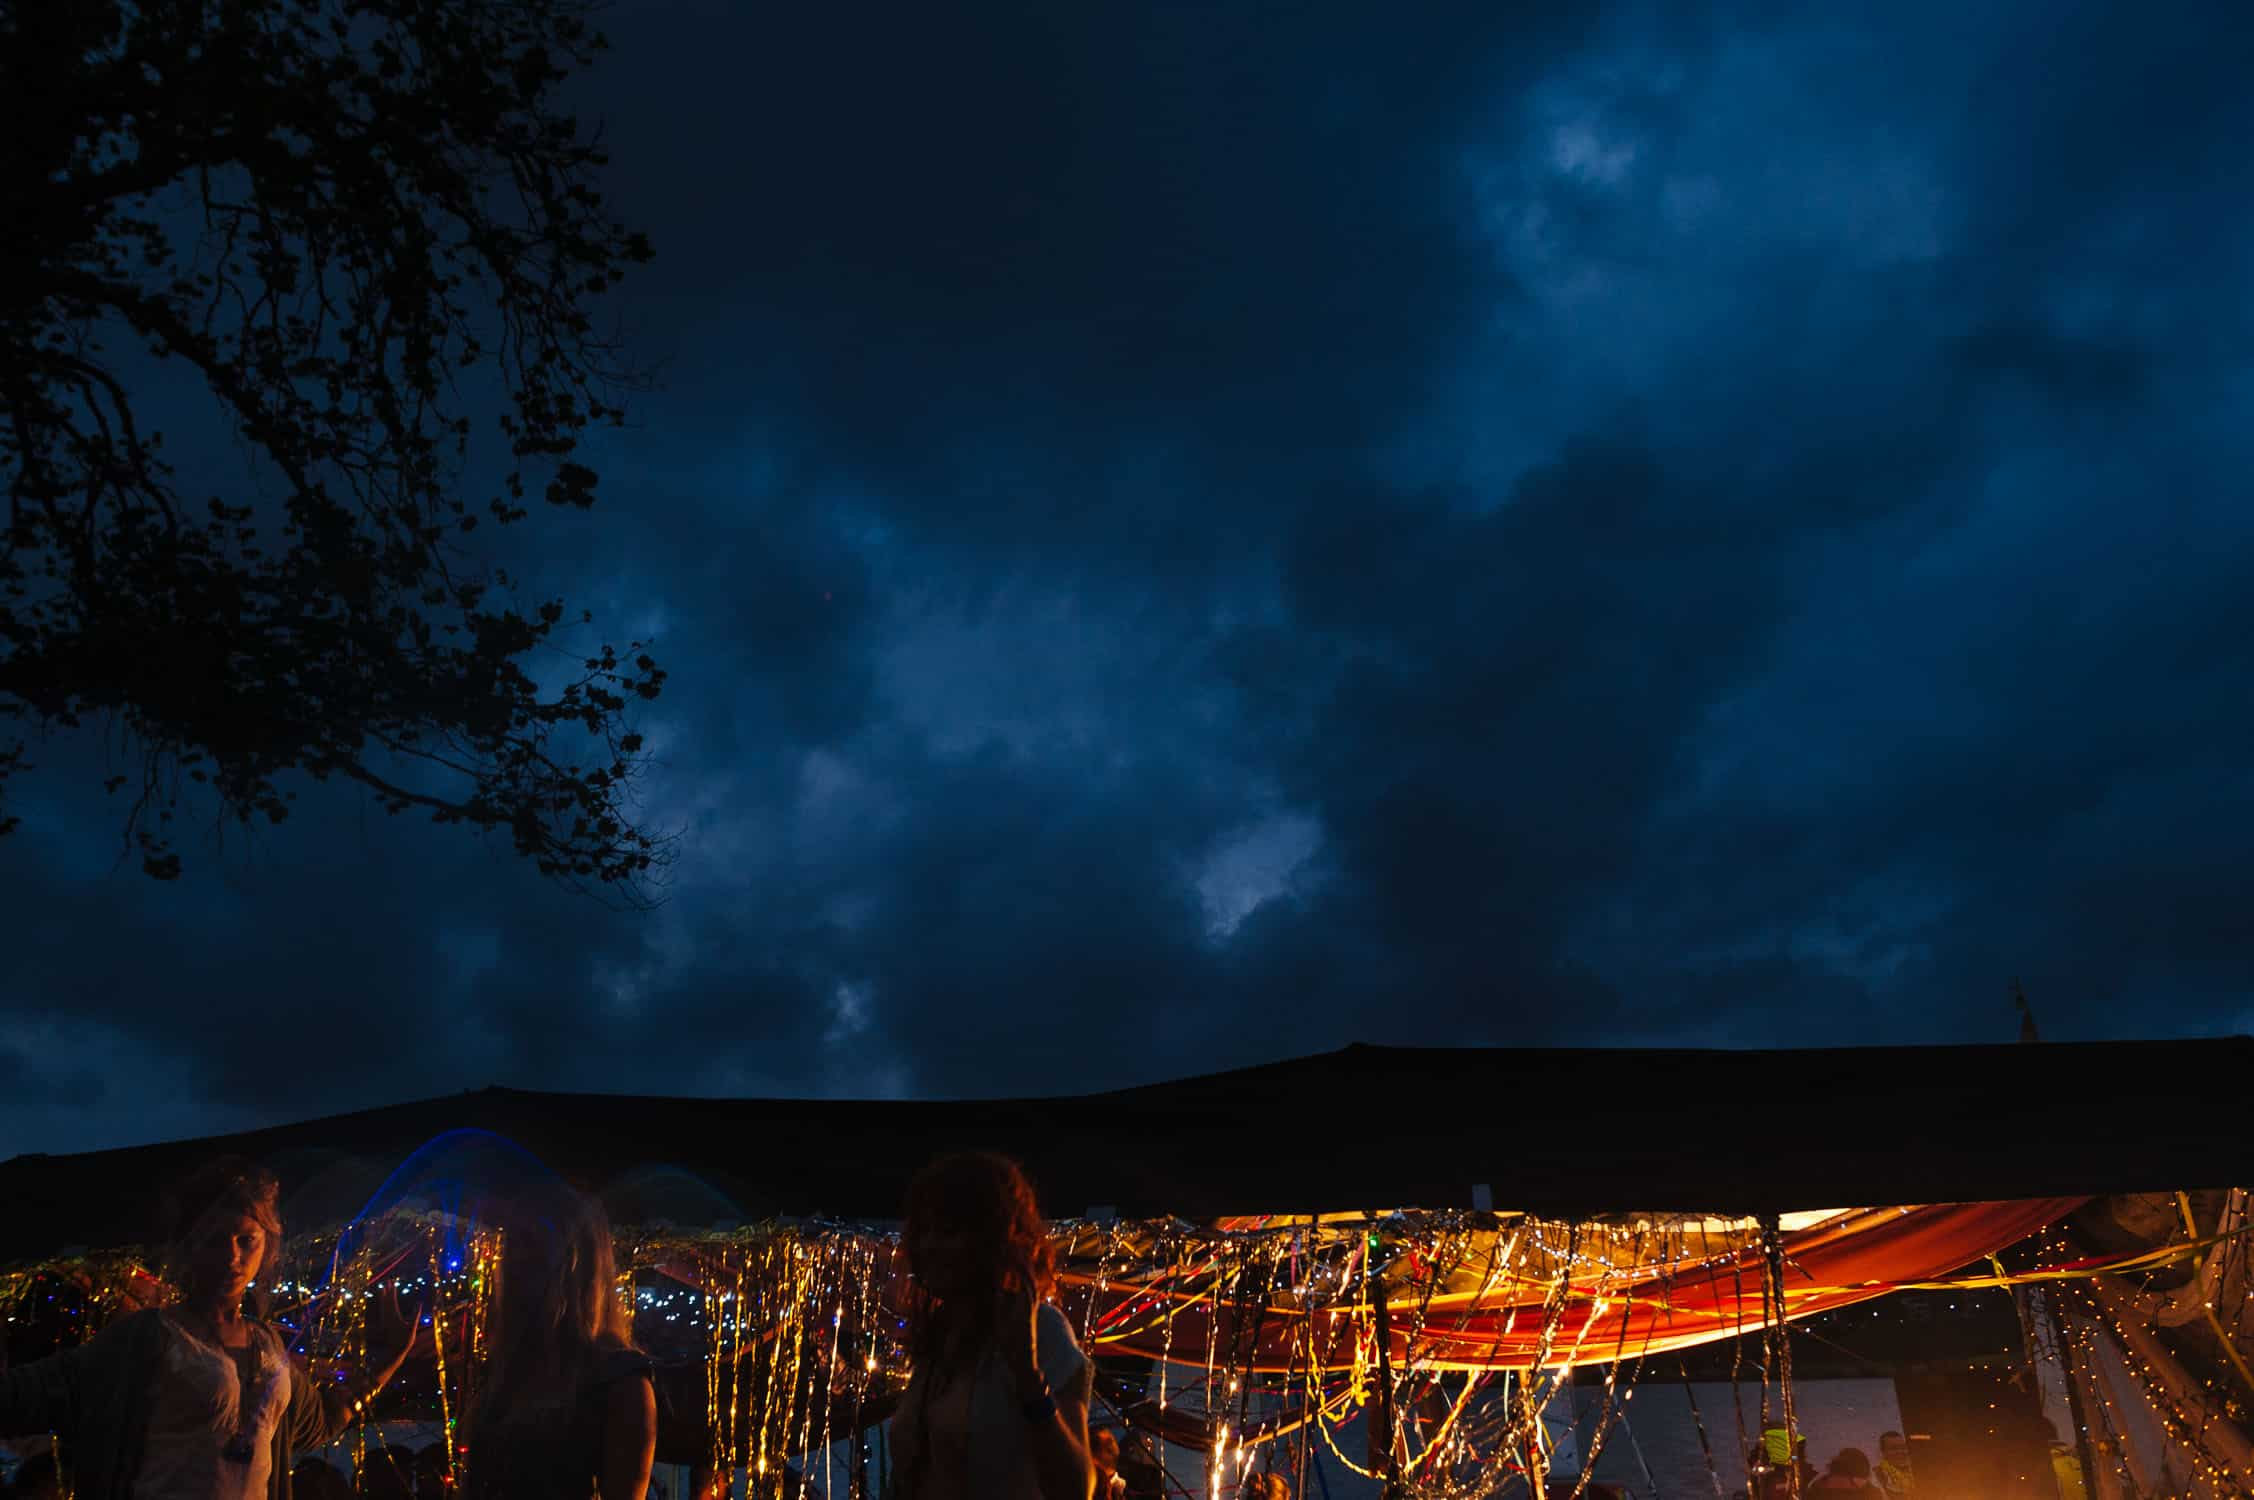 Stormy skies over Underground Cinema Water